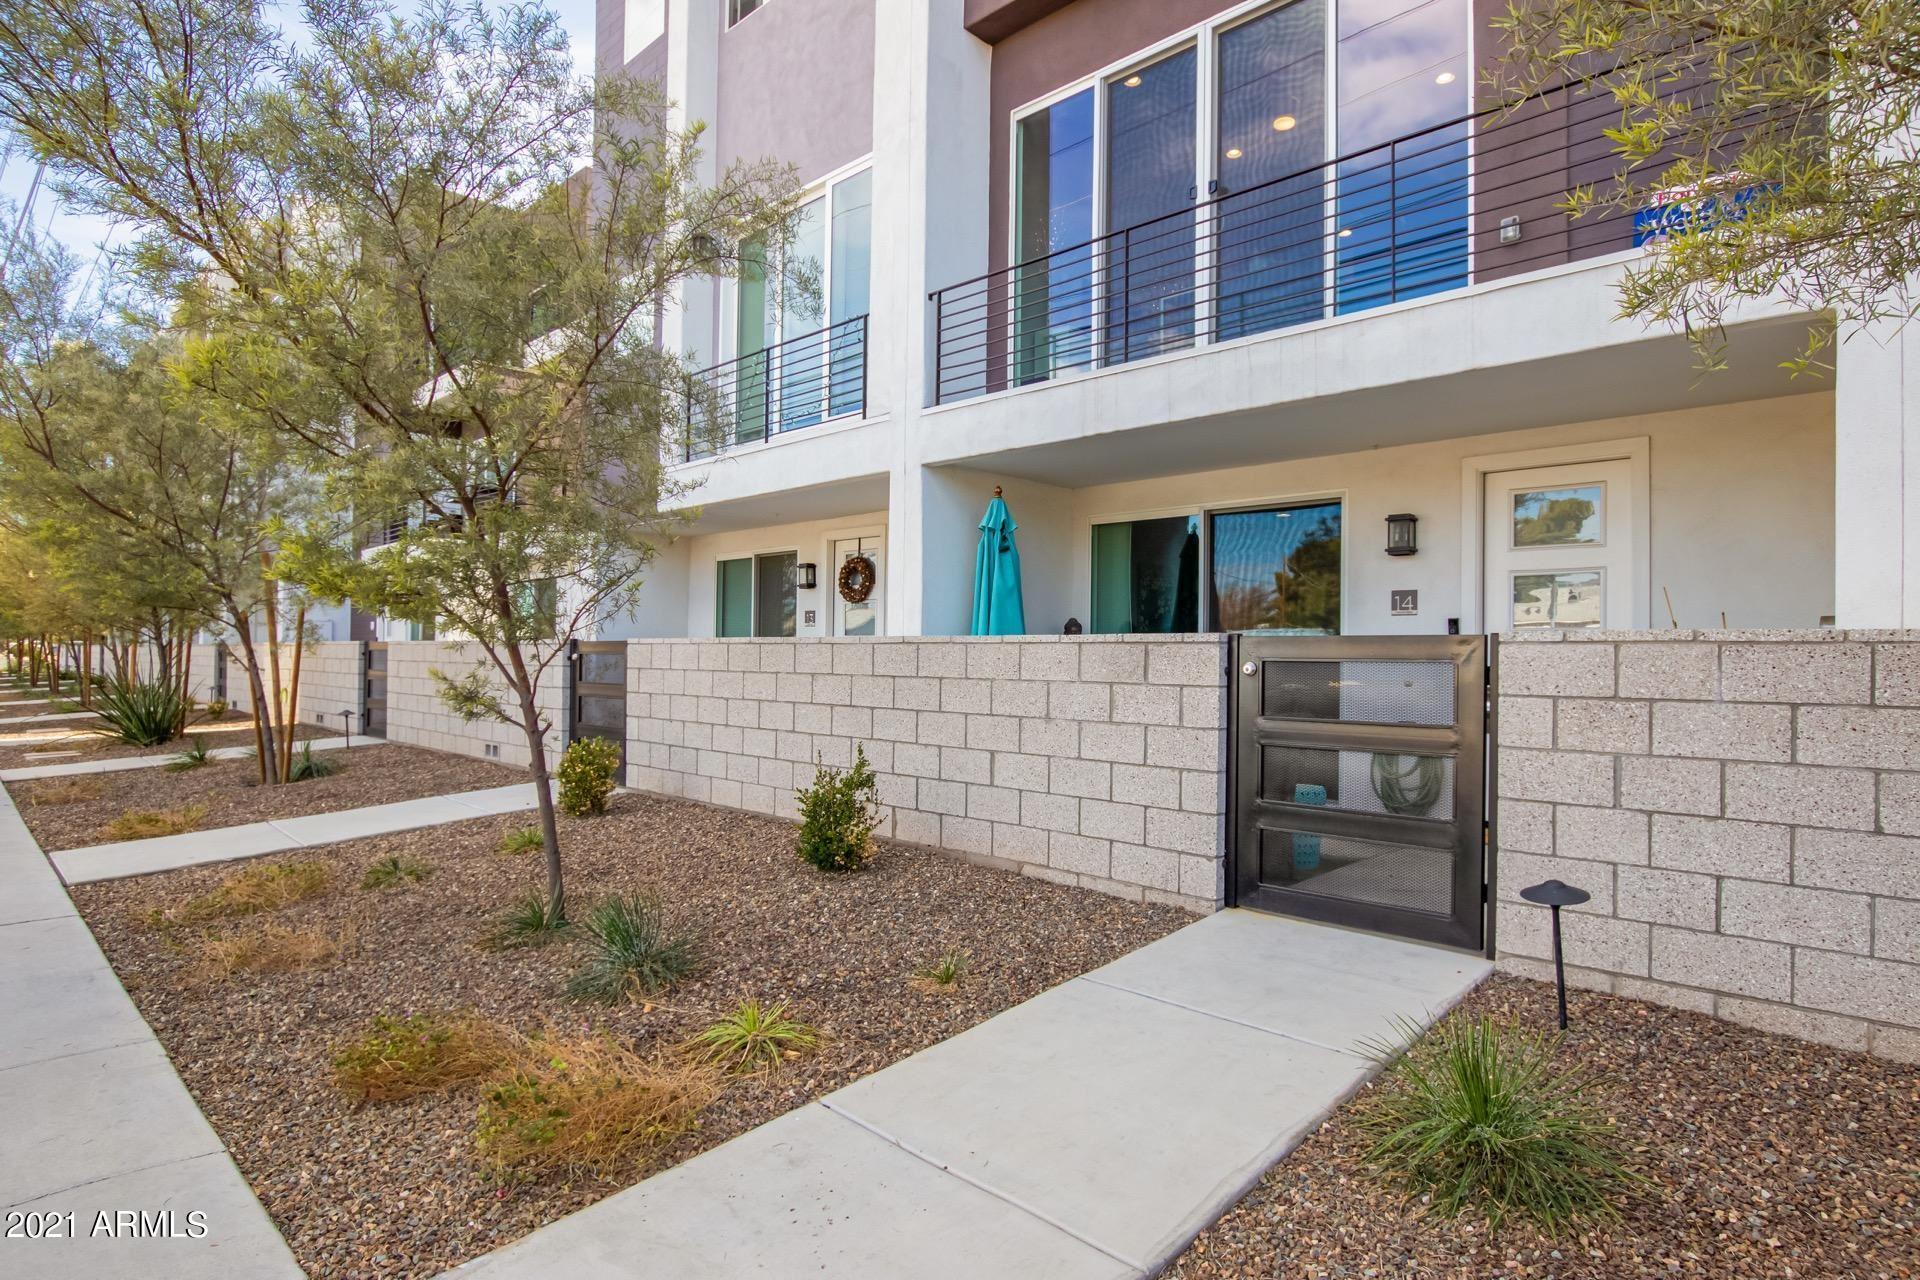 4444 N 25TH Street #14, Phoenix, AZ 85016 - MLS#: 6160496